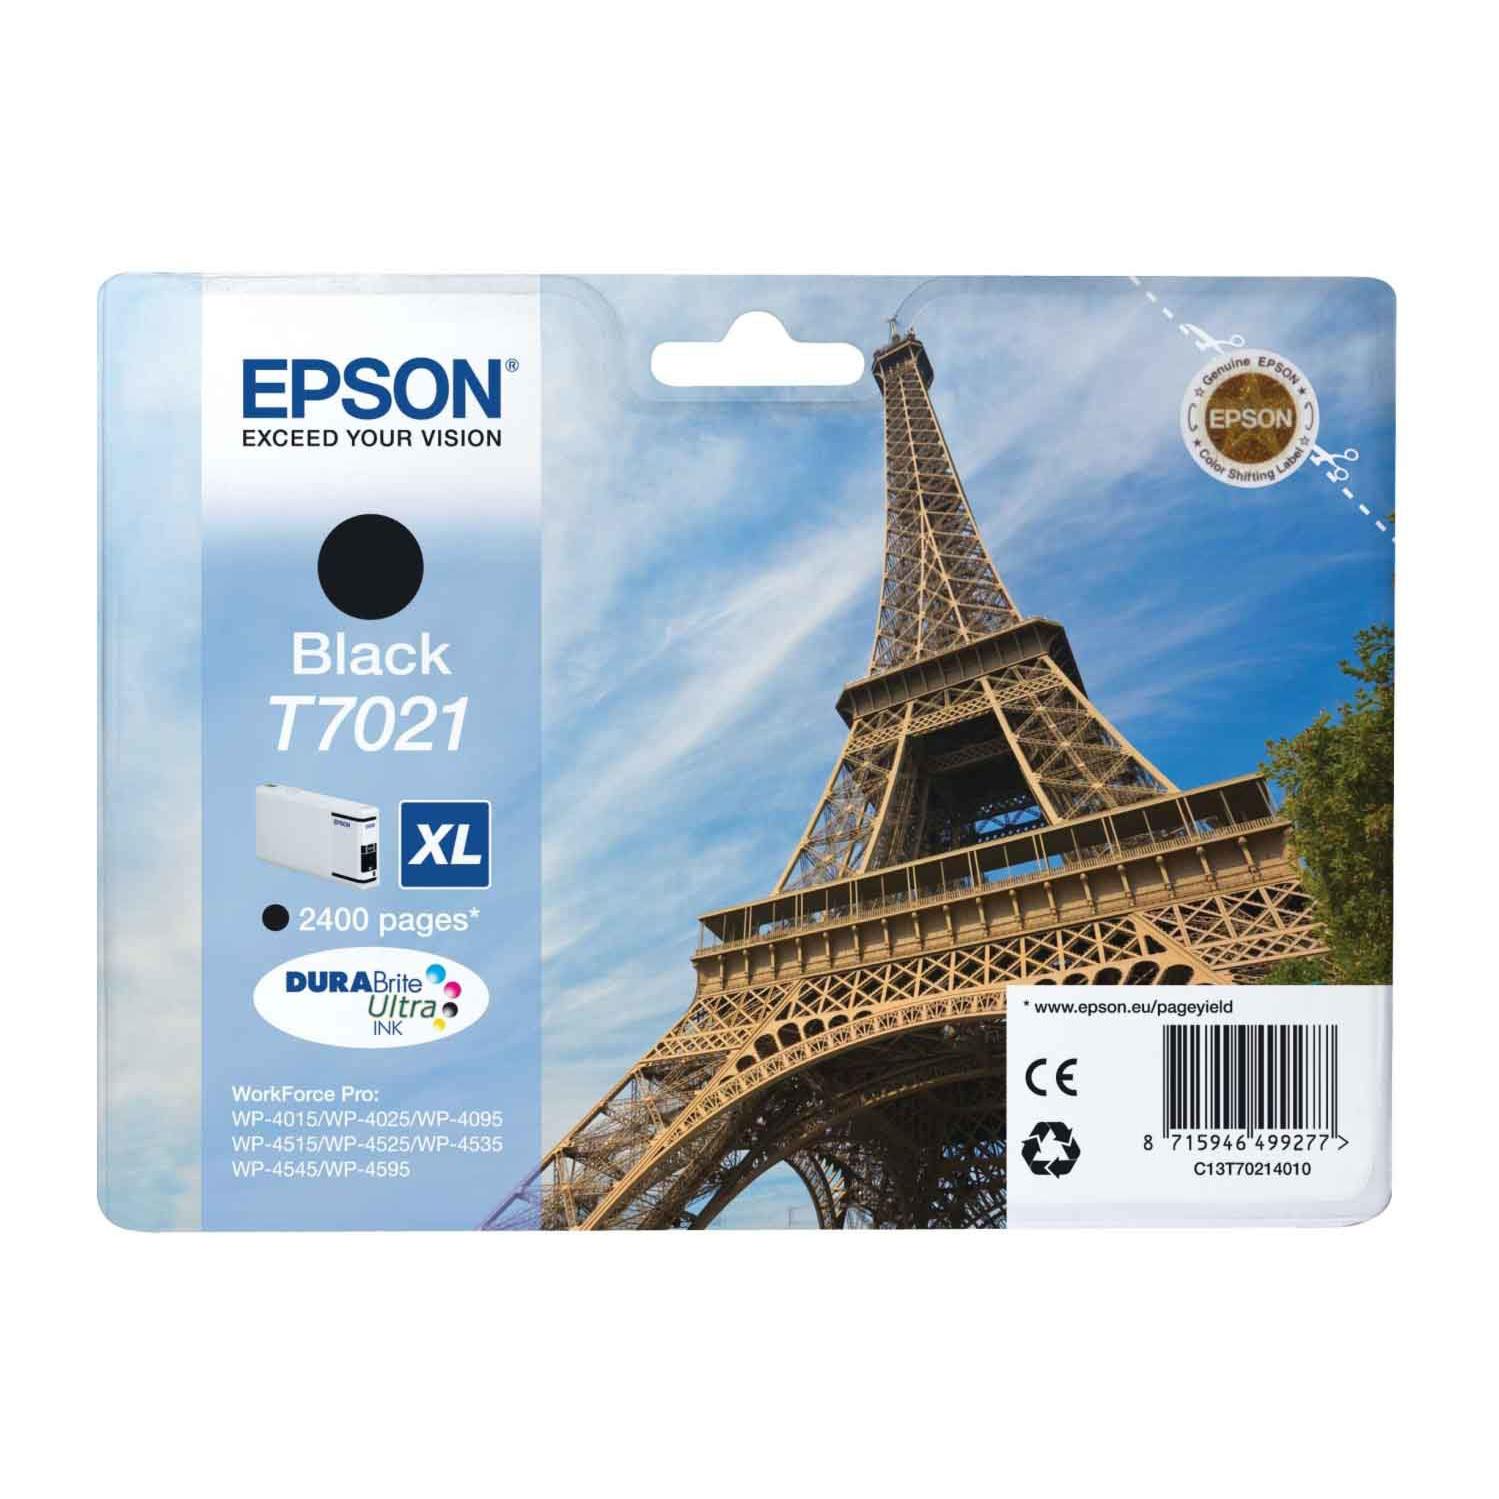 Epson T7021 XL Ink Cartridge - Black